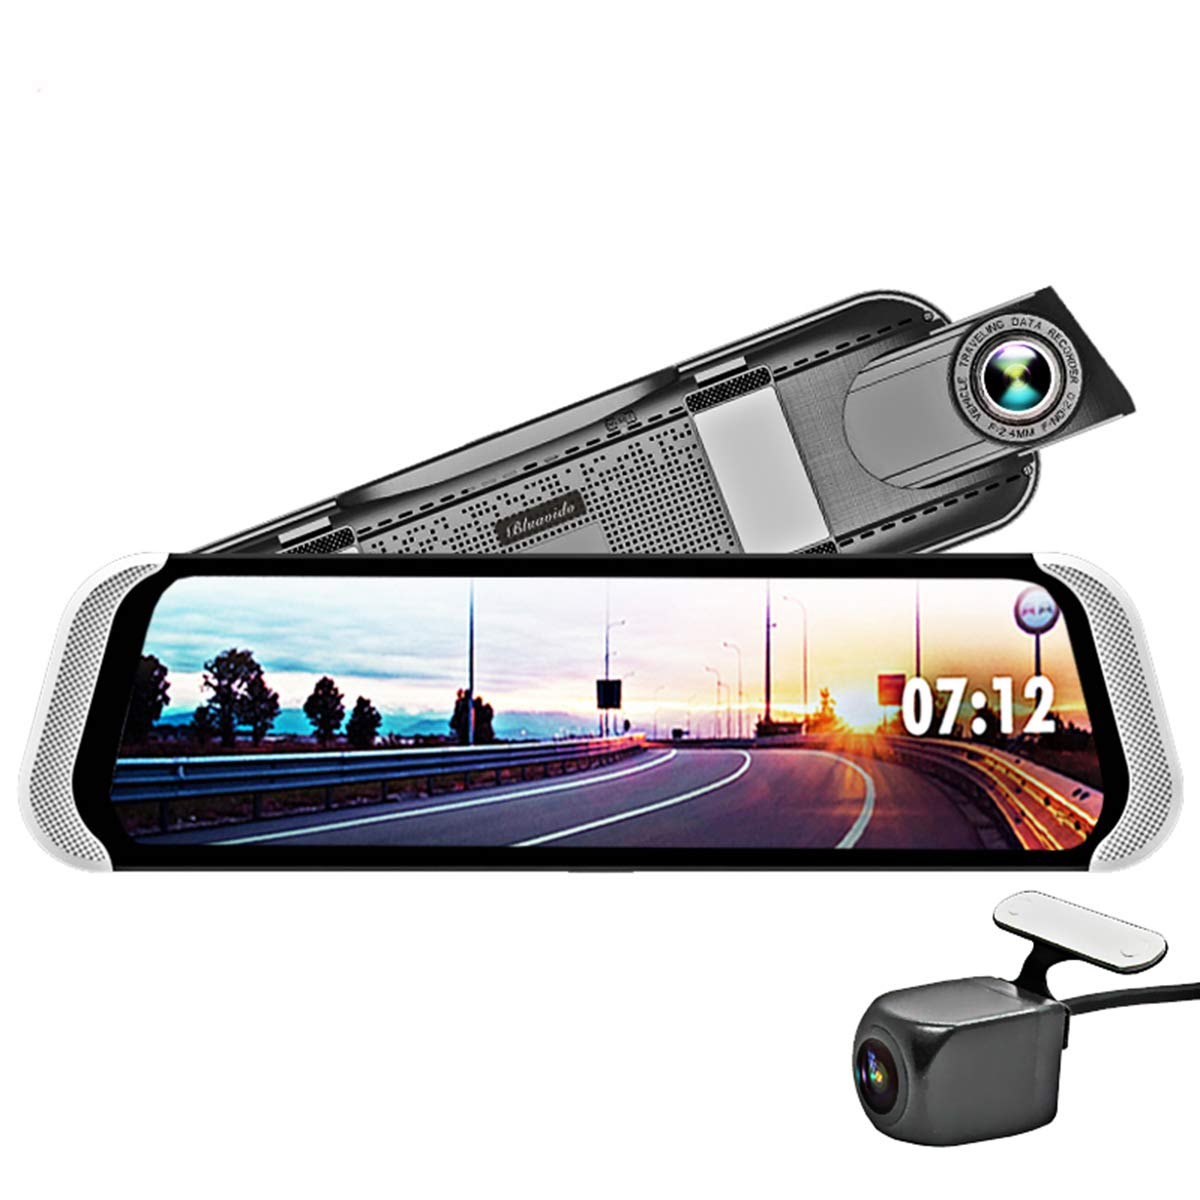 Bluavido 10 Inch 4G Dash Camera Android Rearview Mirror DVR 1080P Dashcam GPS Navigation ADAS Night Vision Dual Lens Car Video Recorder